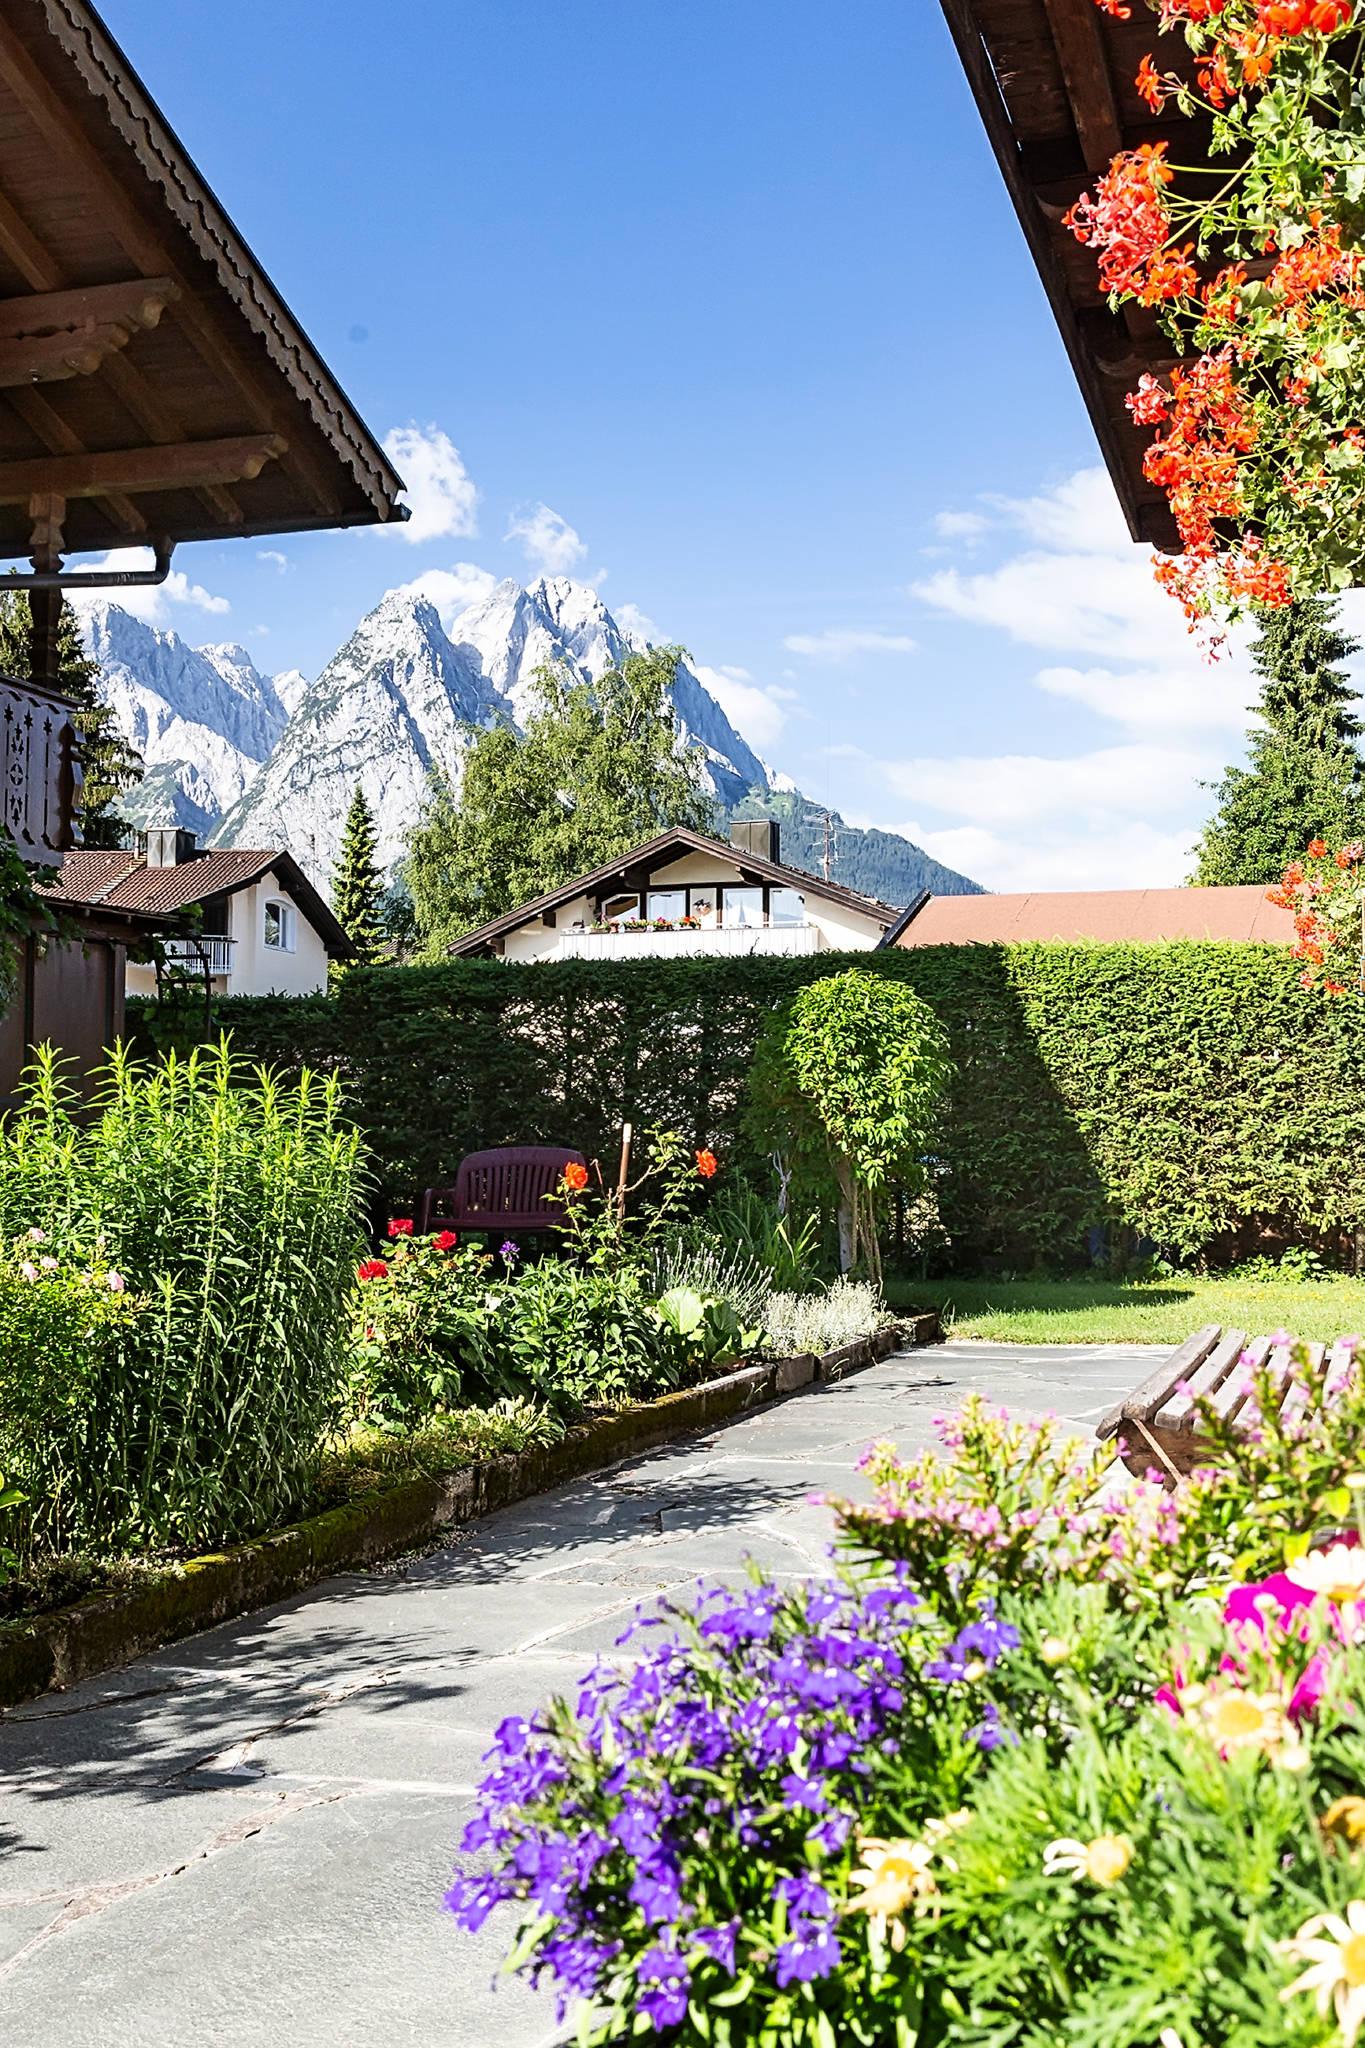 Sprungschanze in Garmisch